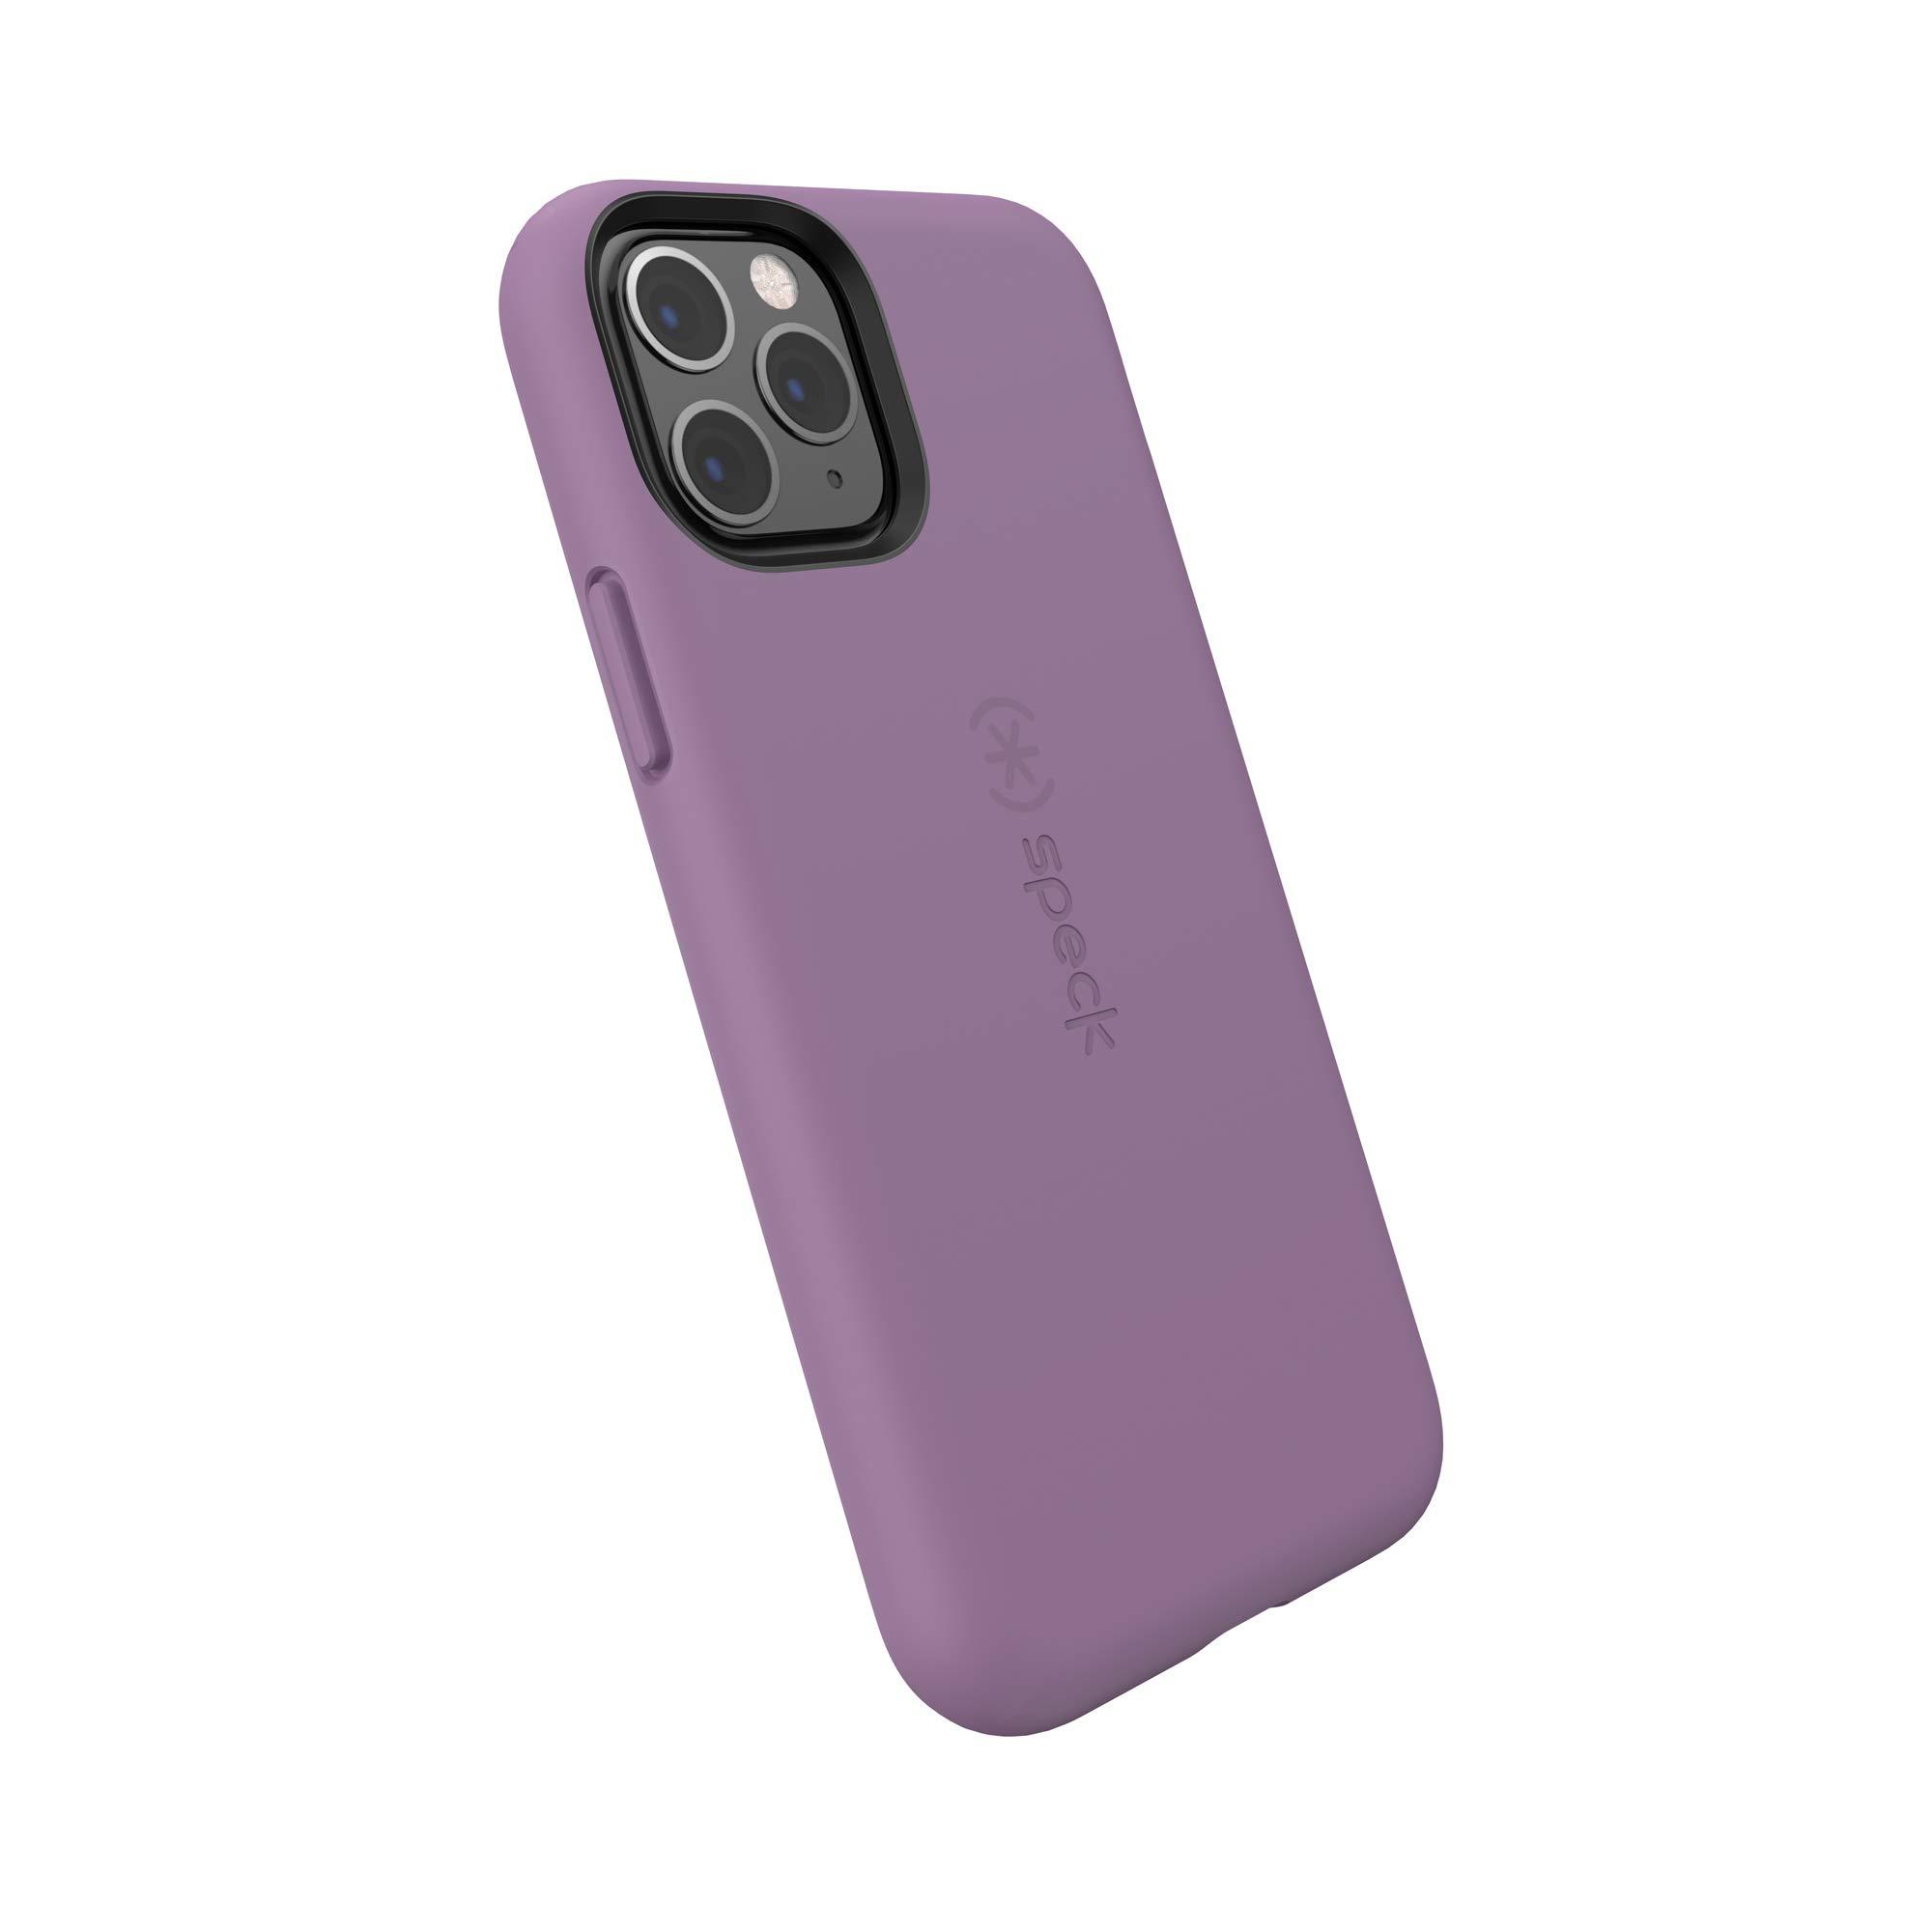 Speck CandyShell Fit iPhone 11 Pro Case, Lilac Purple/Lilac Purple